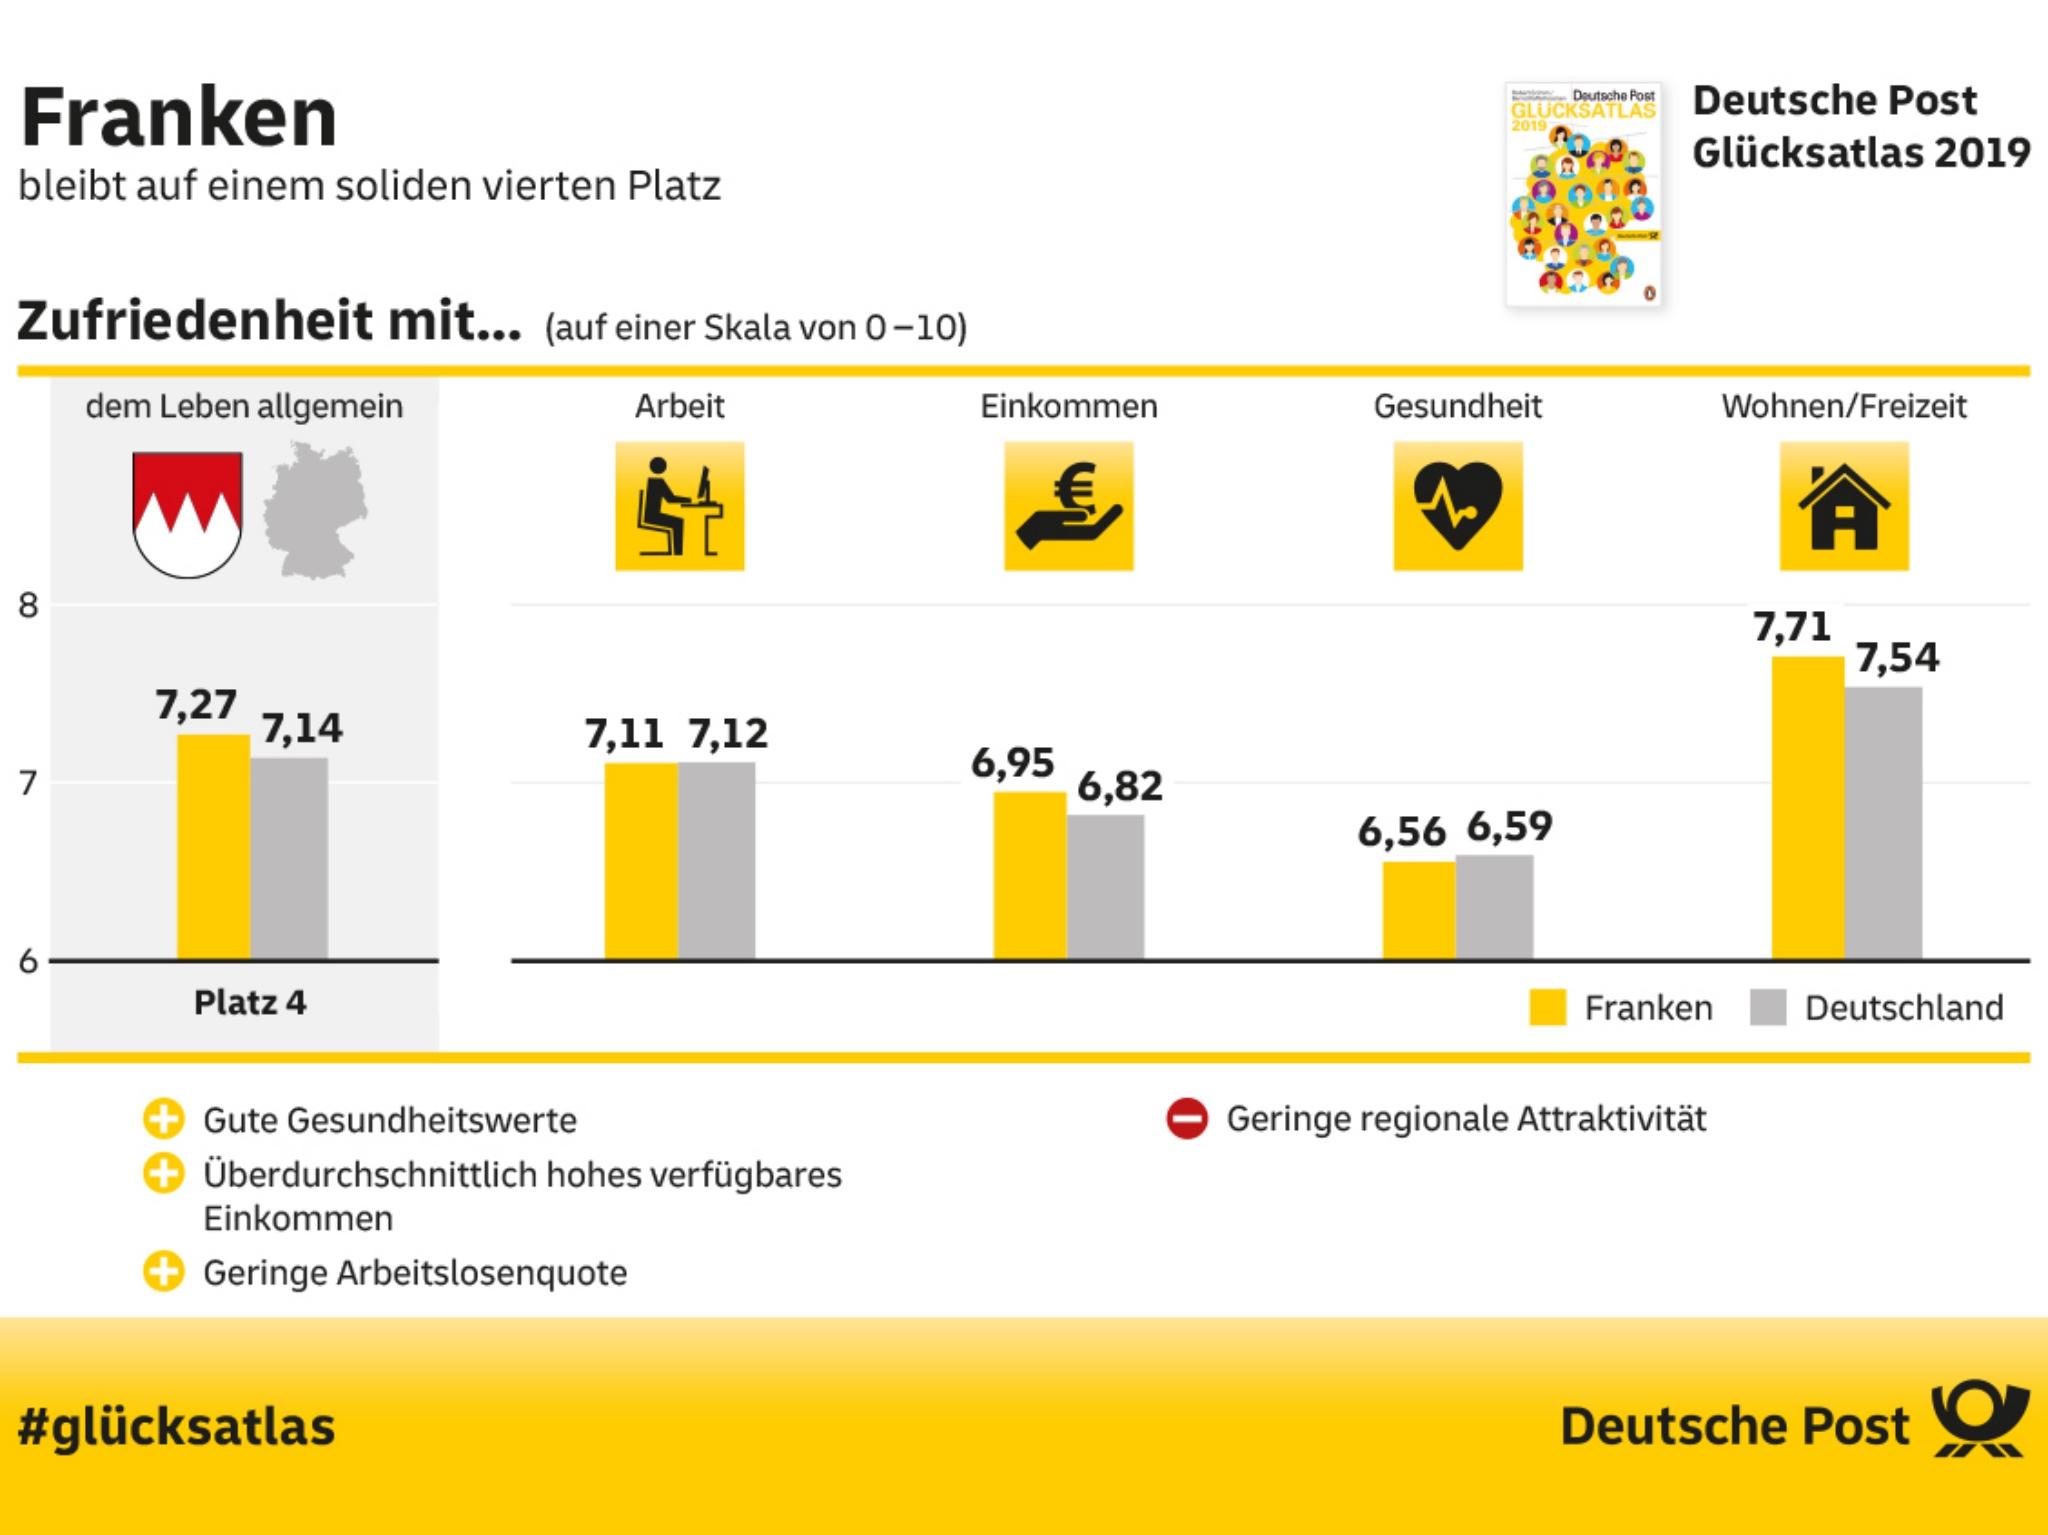 Franken belegt beim Glücksatlas 2019 Platz 4. Grafik: Deutsche Post Glücksatlas